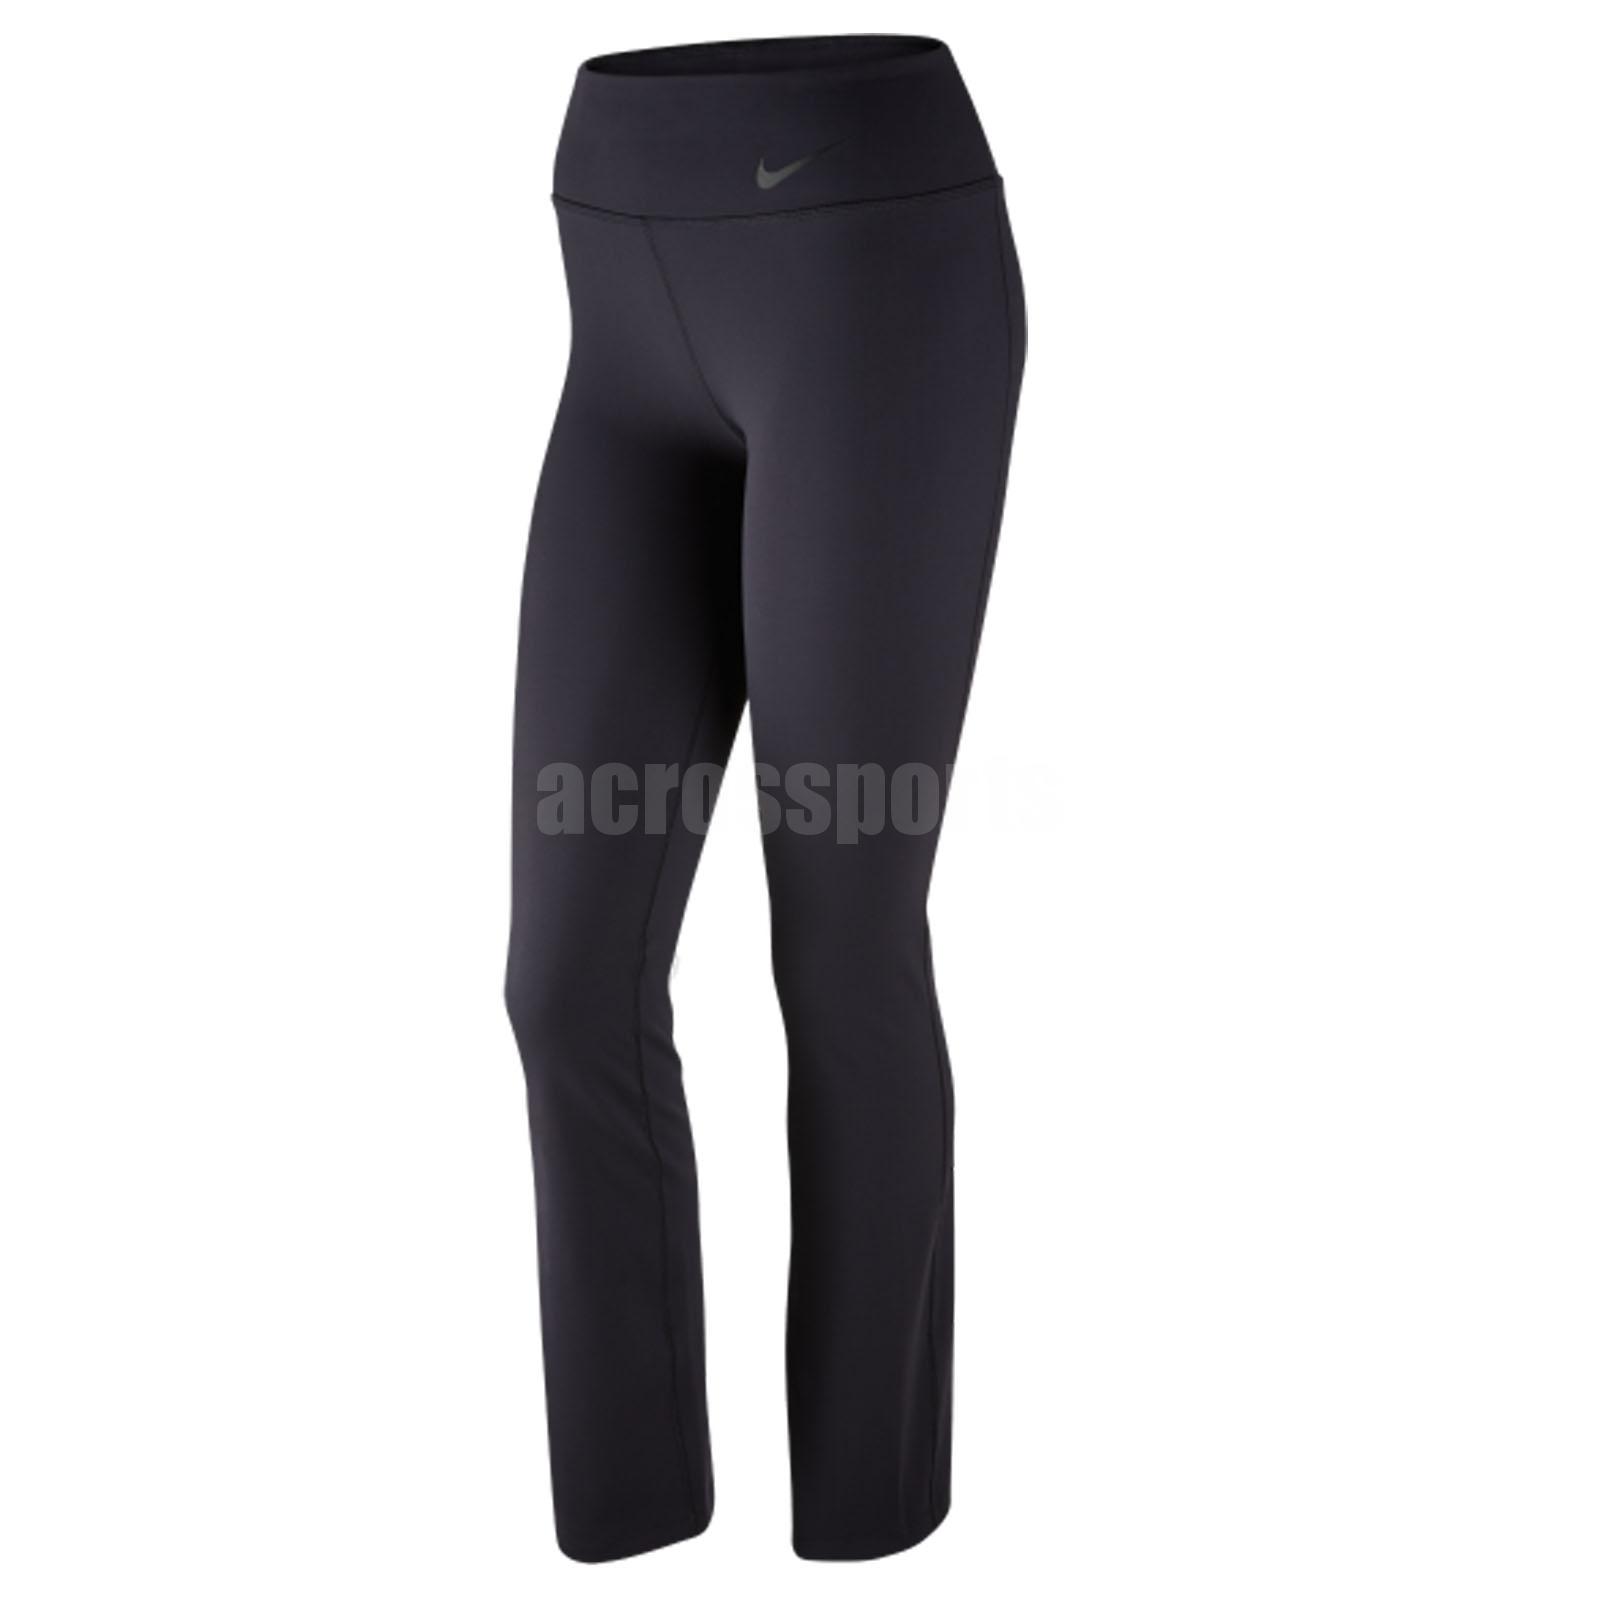 0eae12a5181 Details about Asian Size Nike Legendary Skinny Grey Womens Yoga Pants  Sweatpants 642539-012